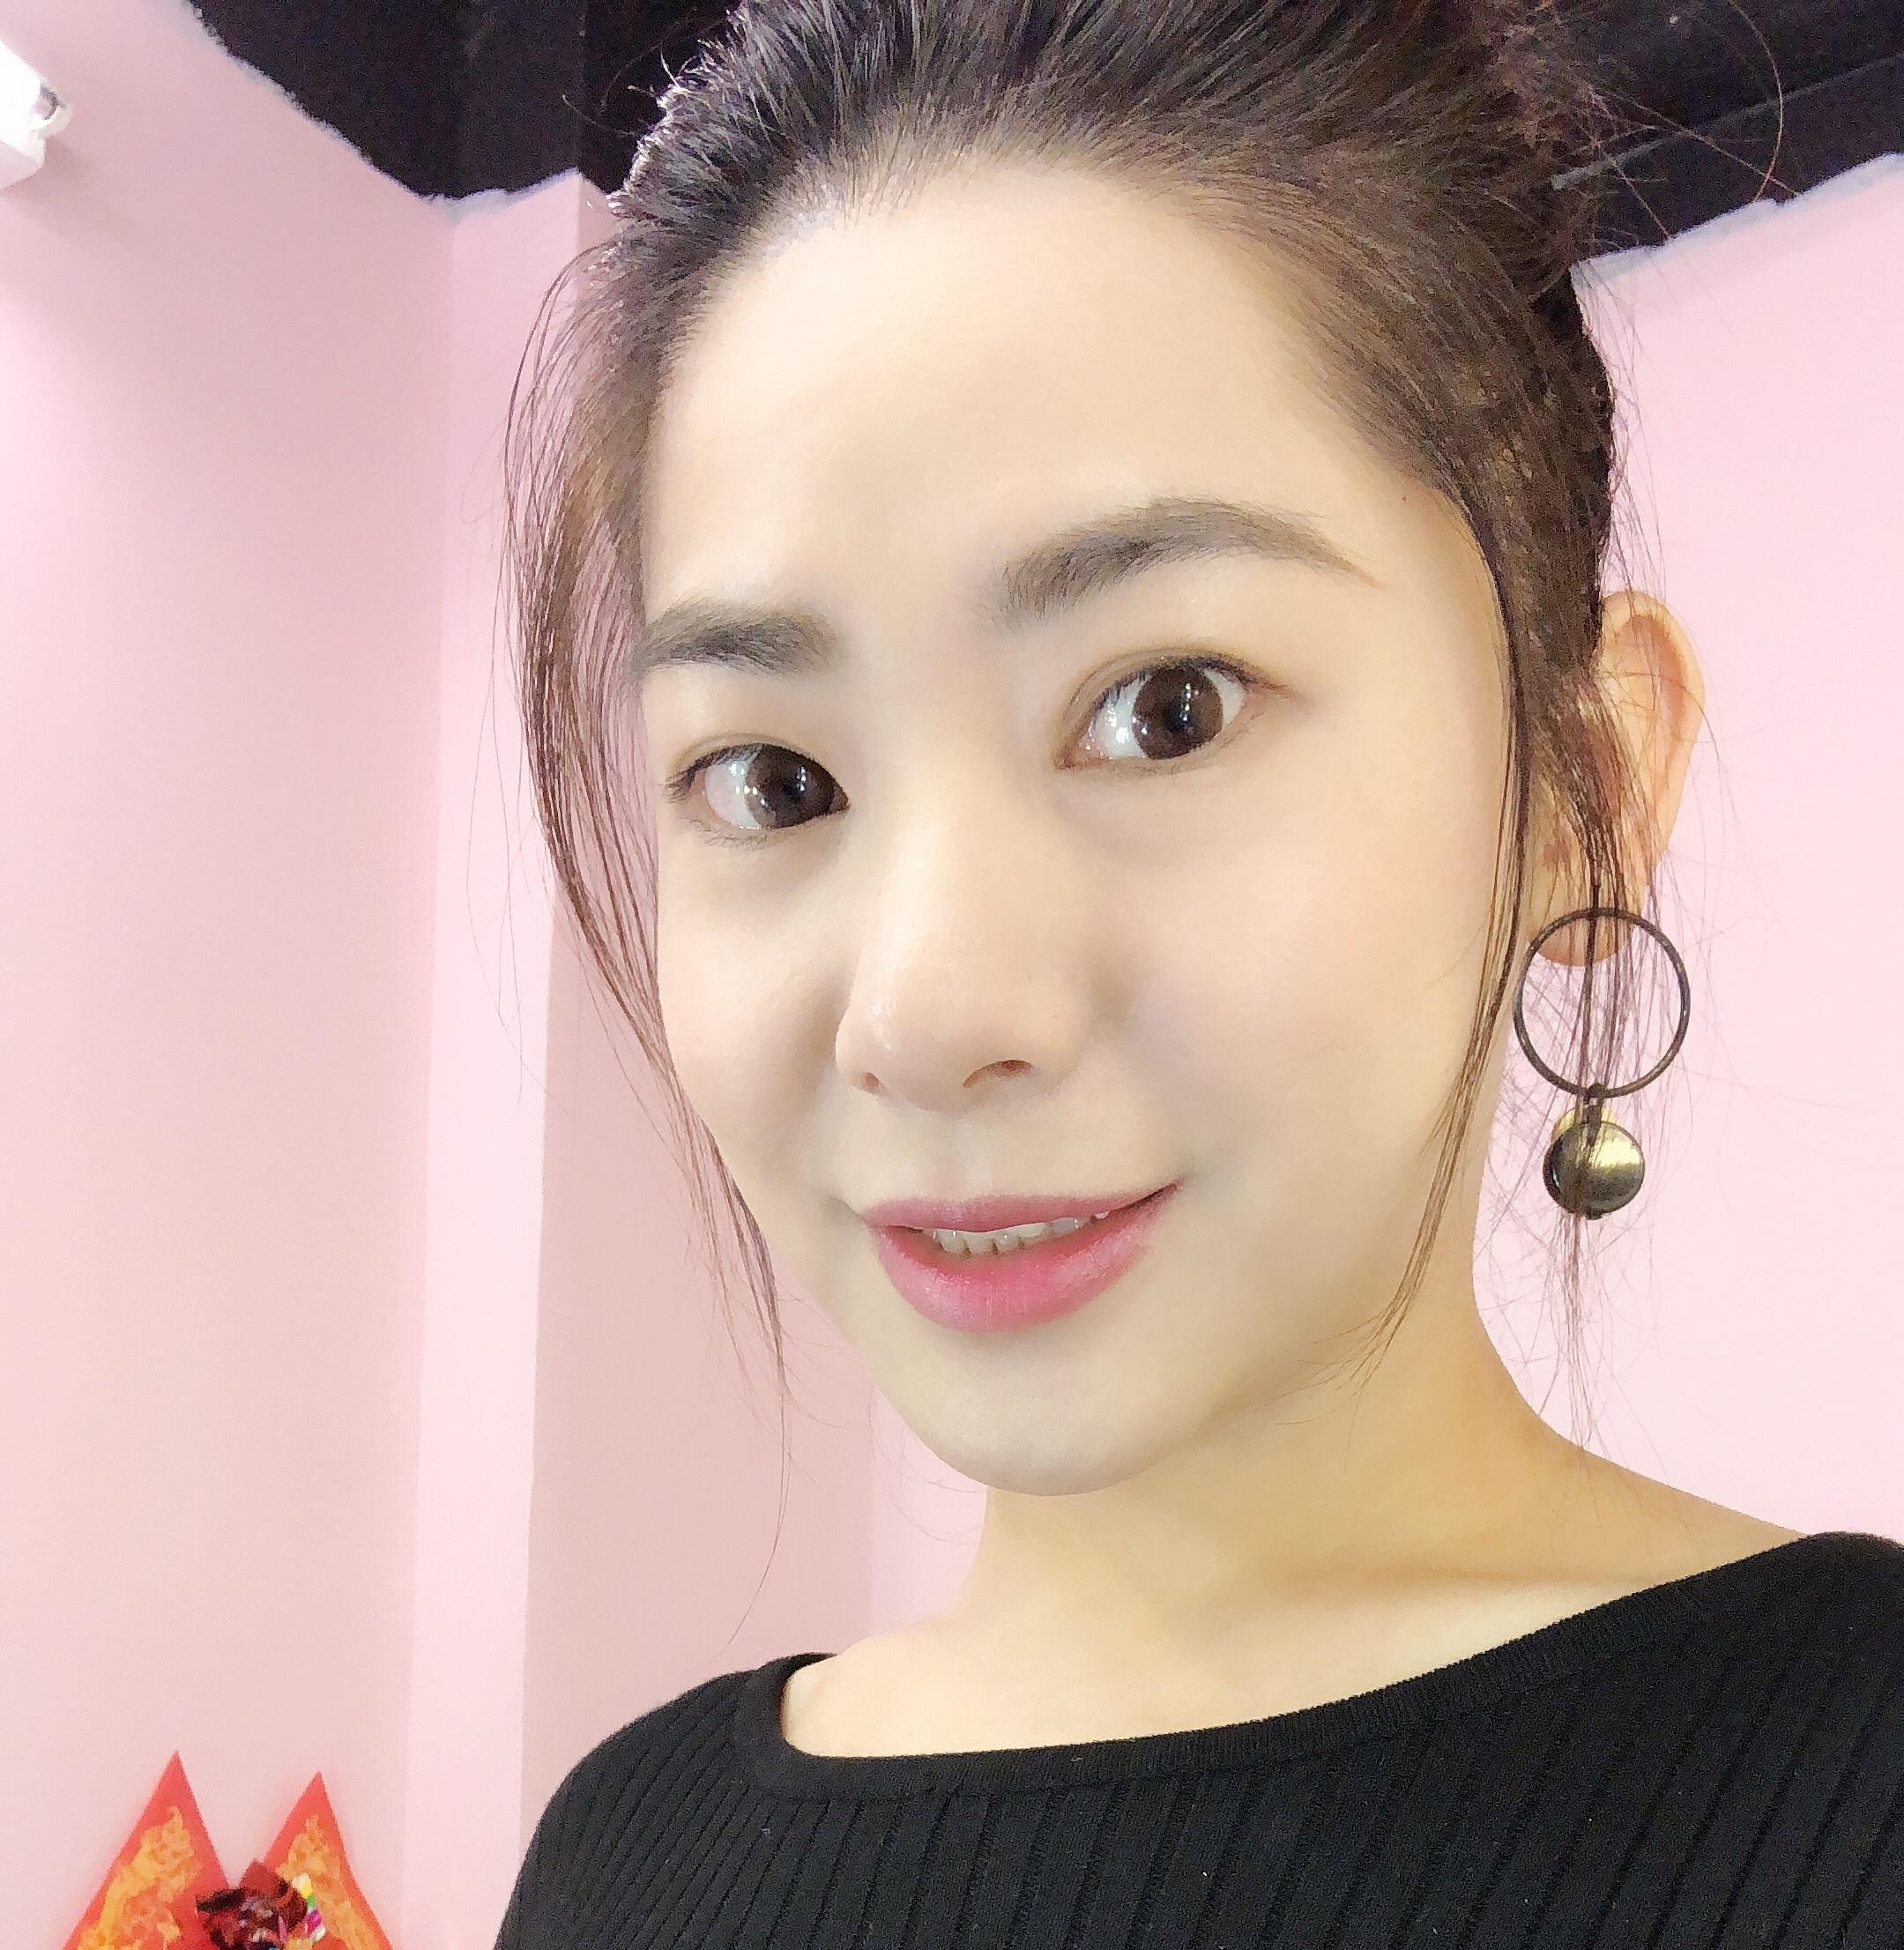 化妝師 Makeup Artist:Chrisby wong - Chrisby wong@青年創業軍